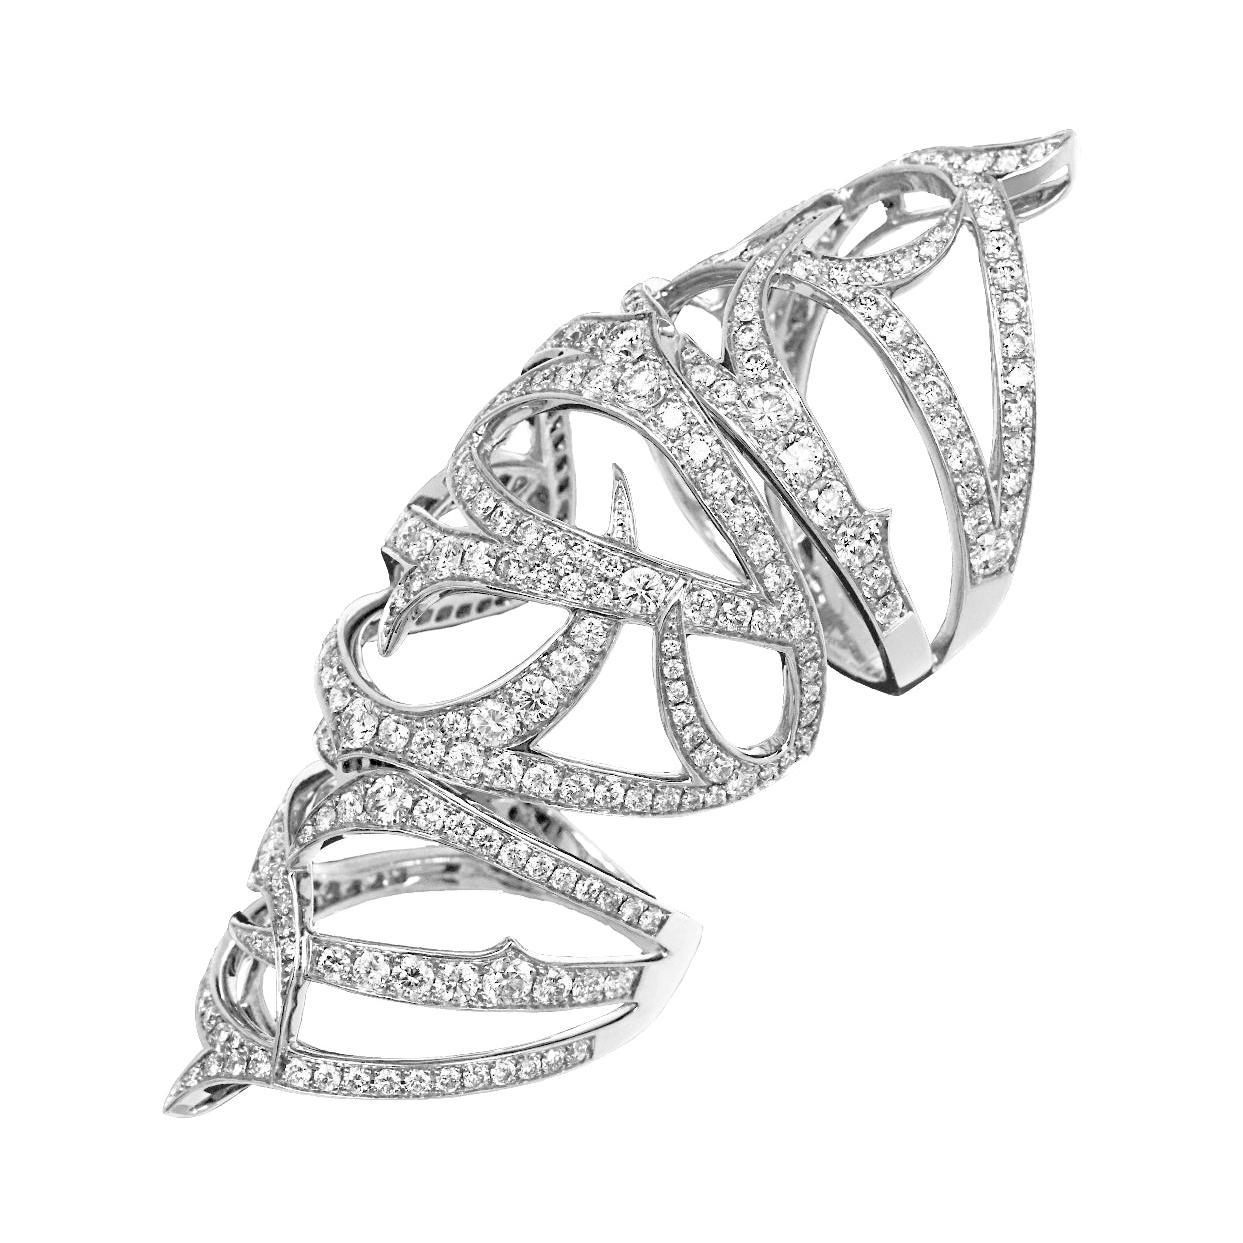 Stephen Webster Thorn 18 Carat Gold and White Diamond Pavé Long Finger Ring